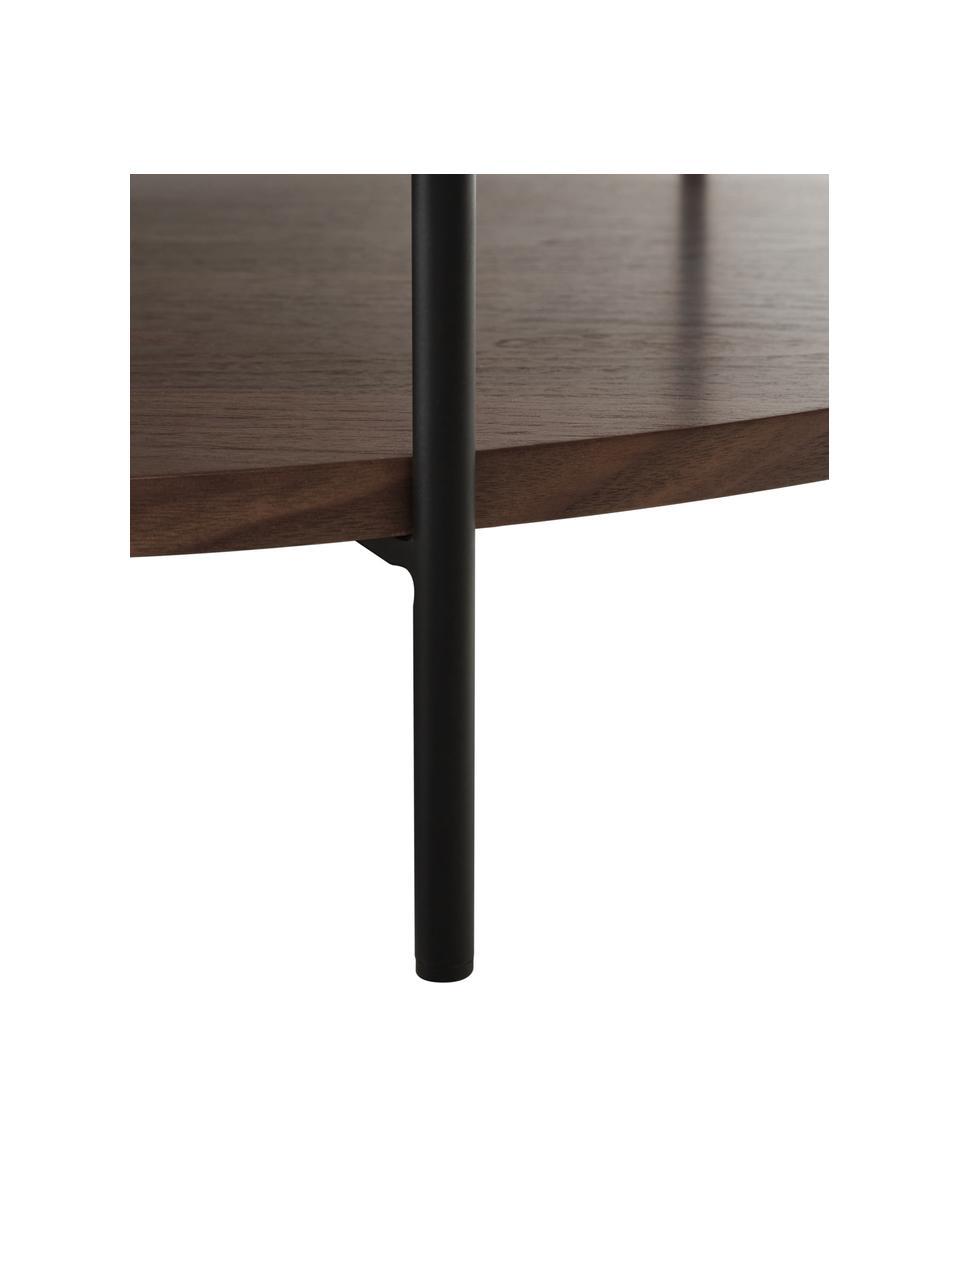 Grande table basse en bois avec rangement Renee, Brun